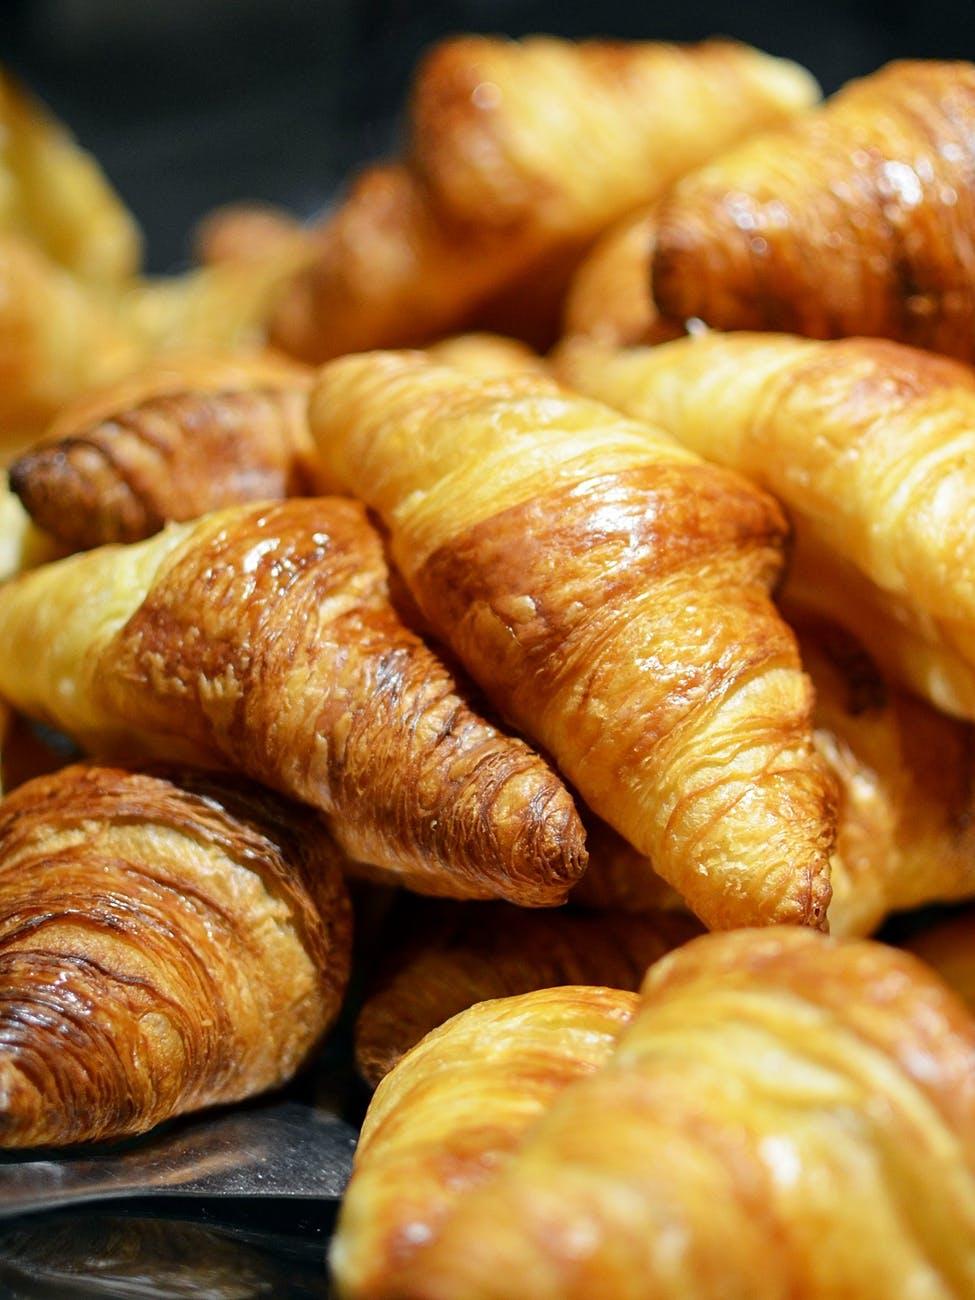 Piles of freshly baked croissants.